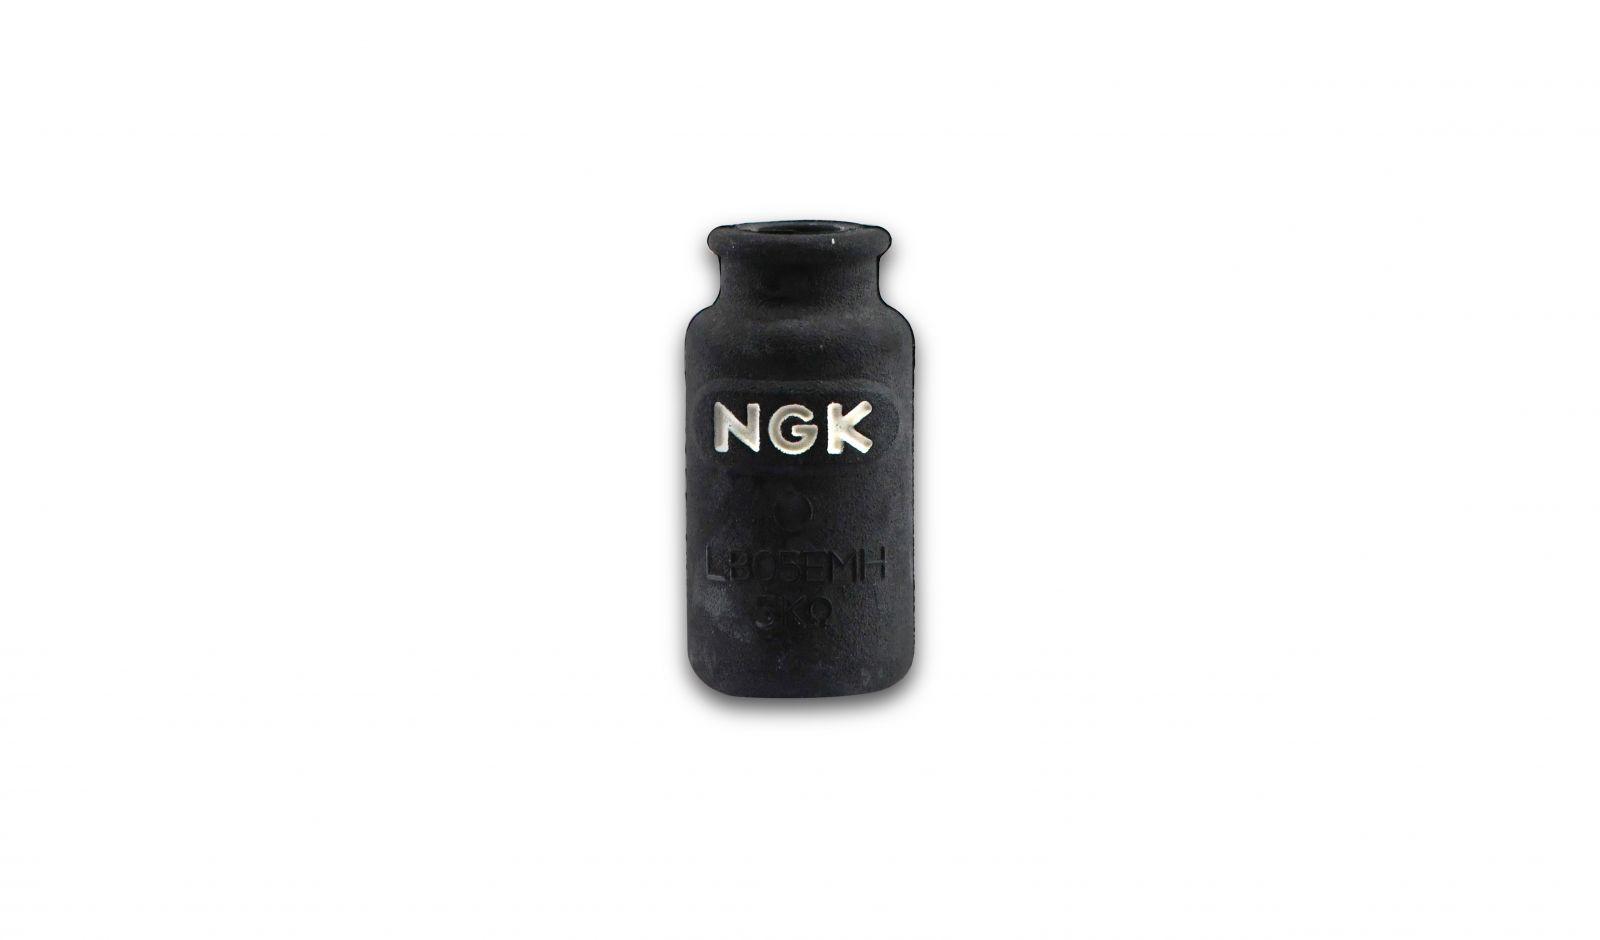 spark plug caps (ngk) - 611025NB image